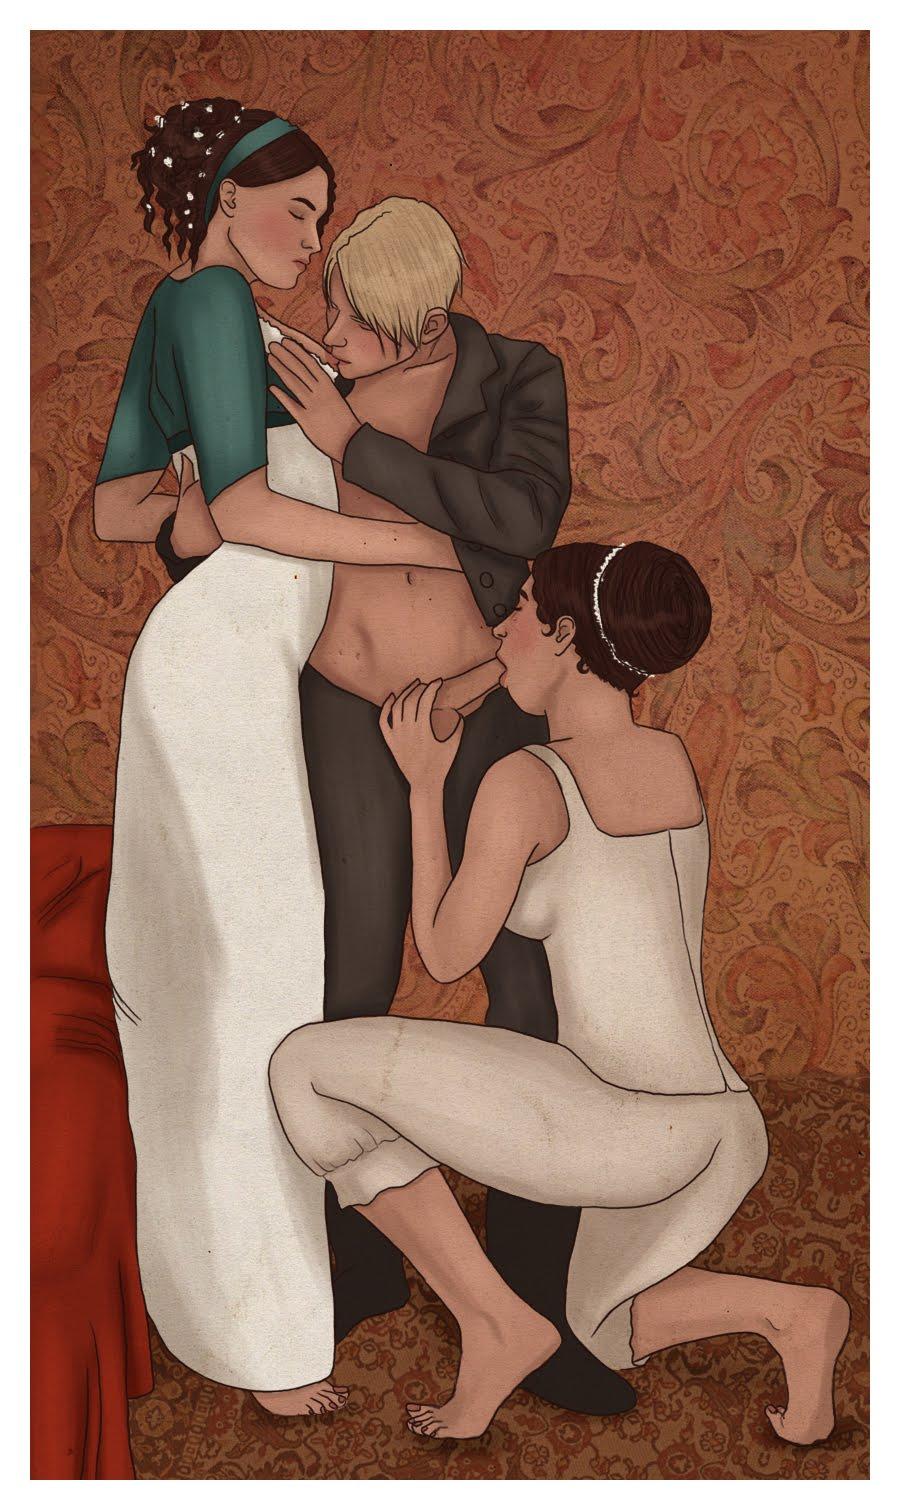 Malfoy naked